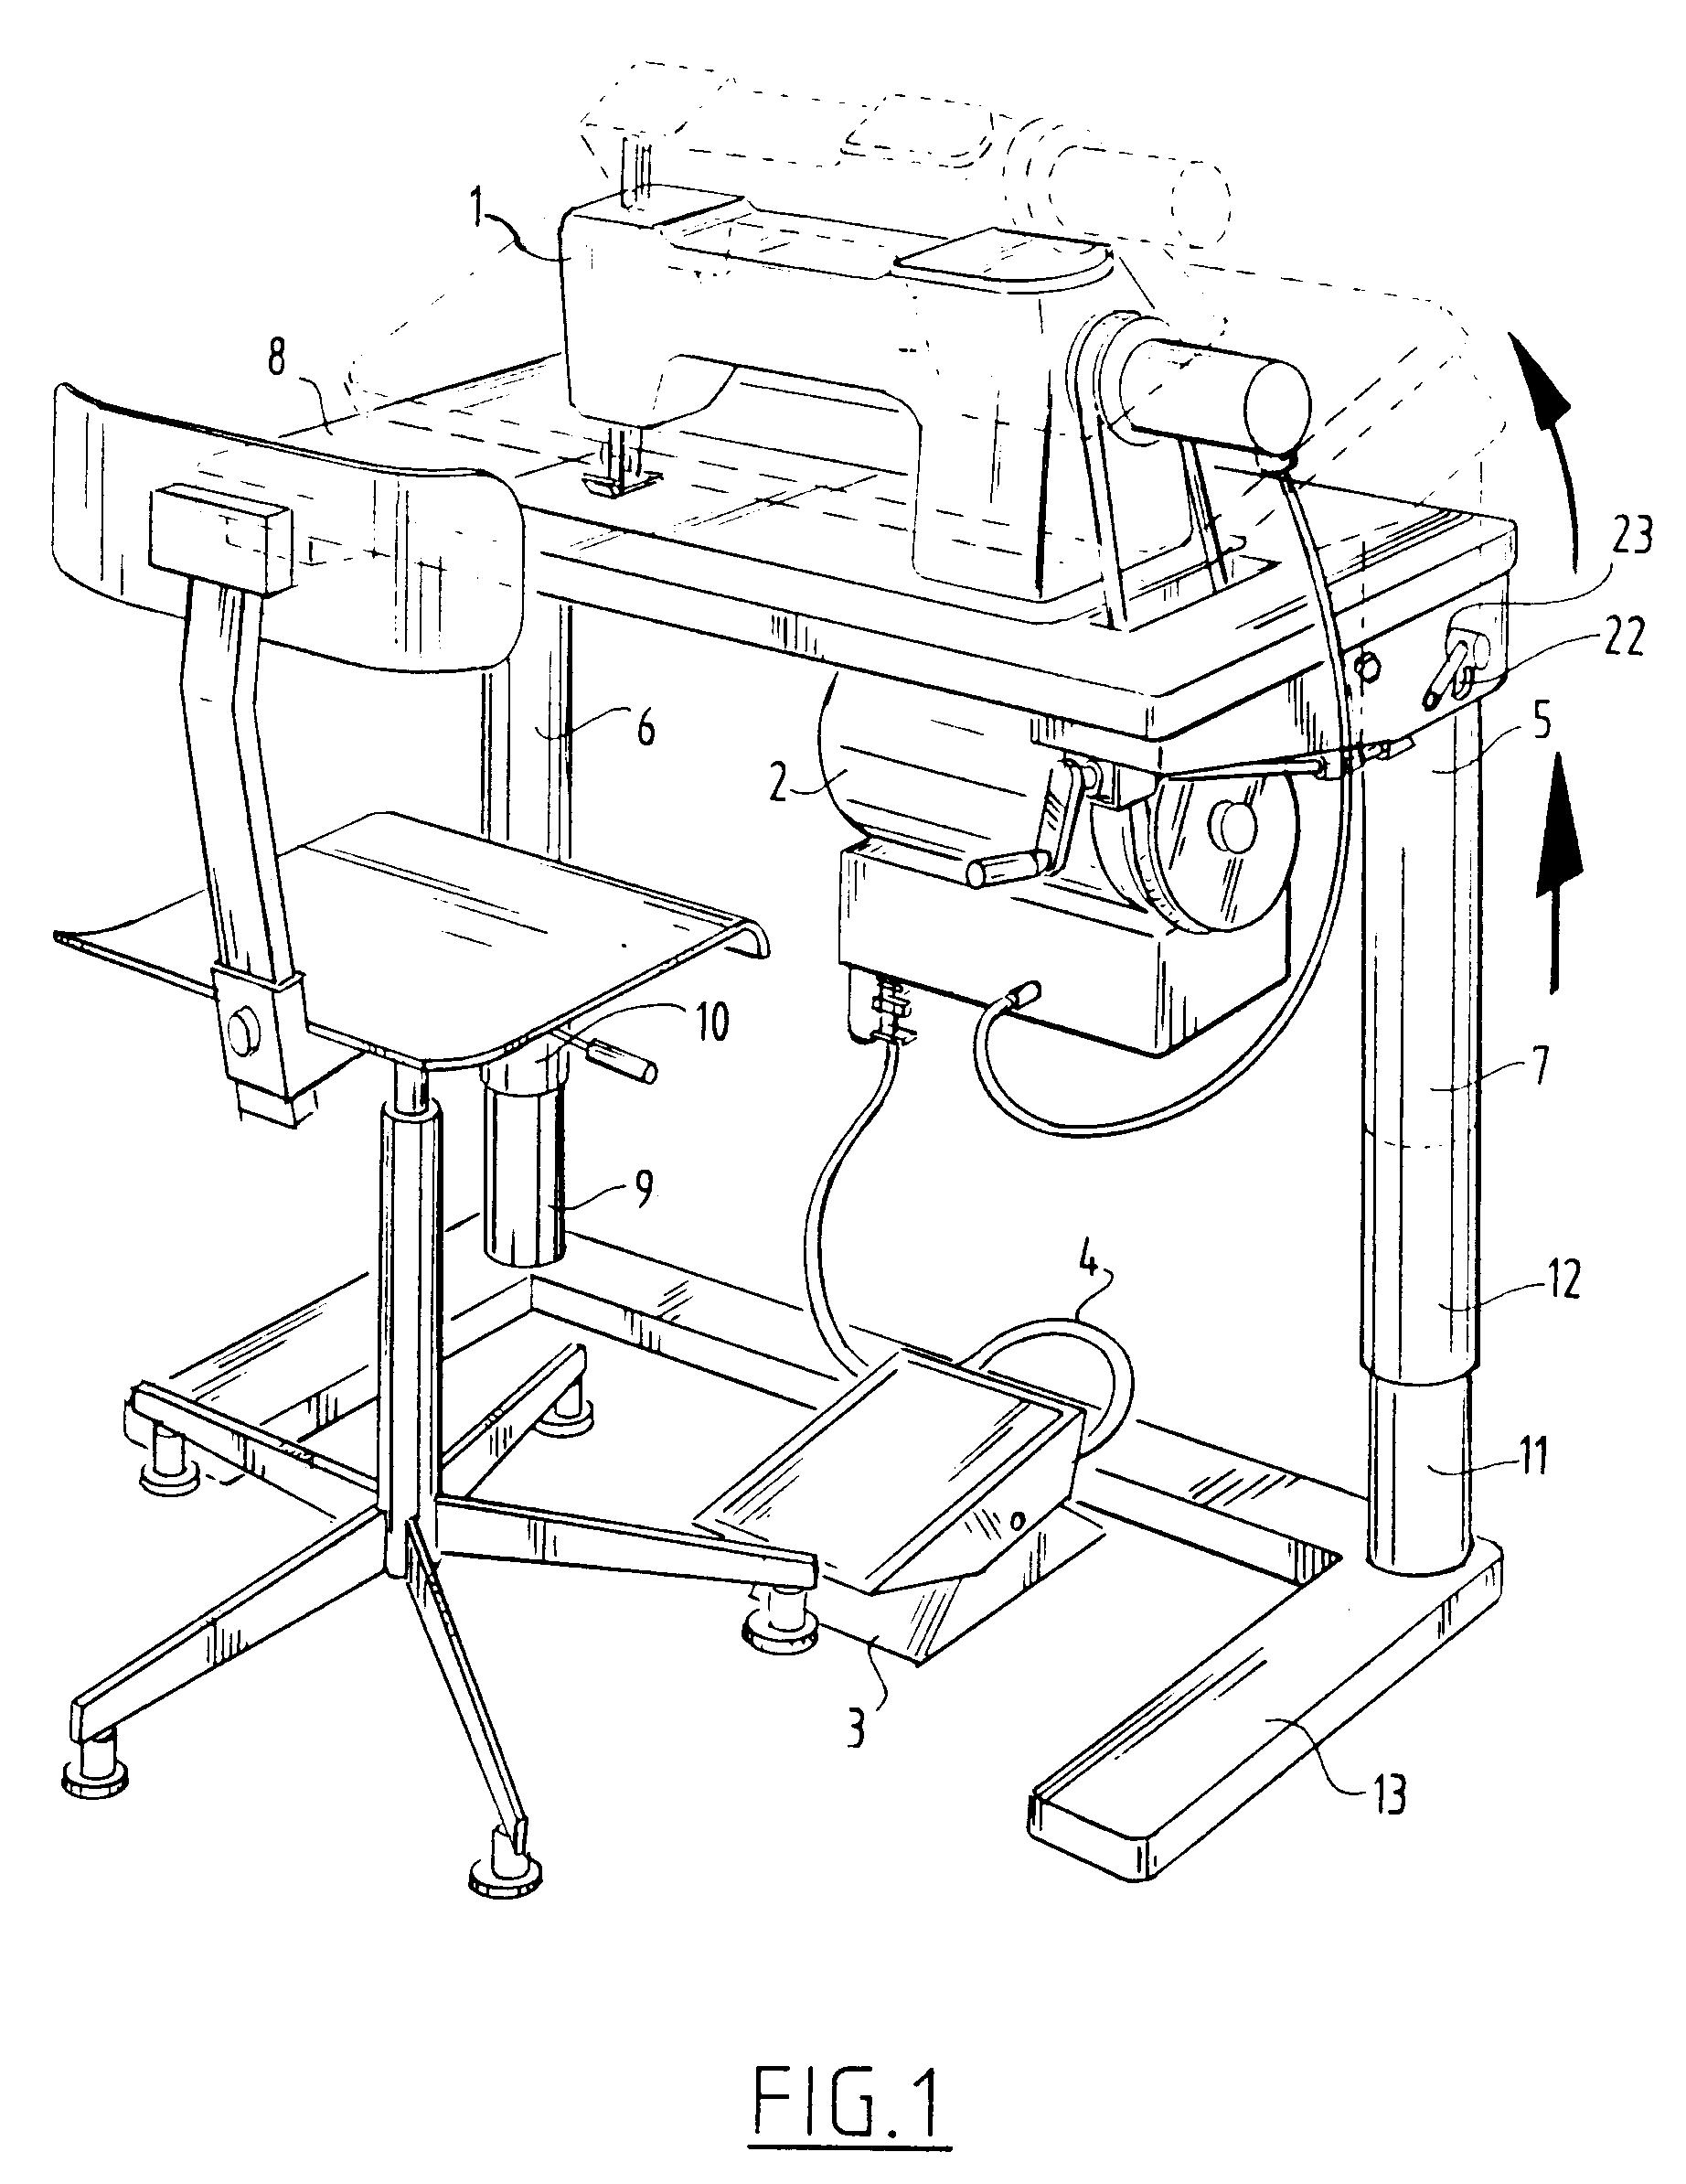 Kenmore 28 Sewing Machine Manual